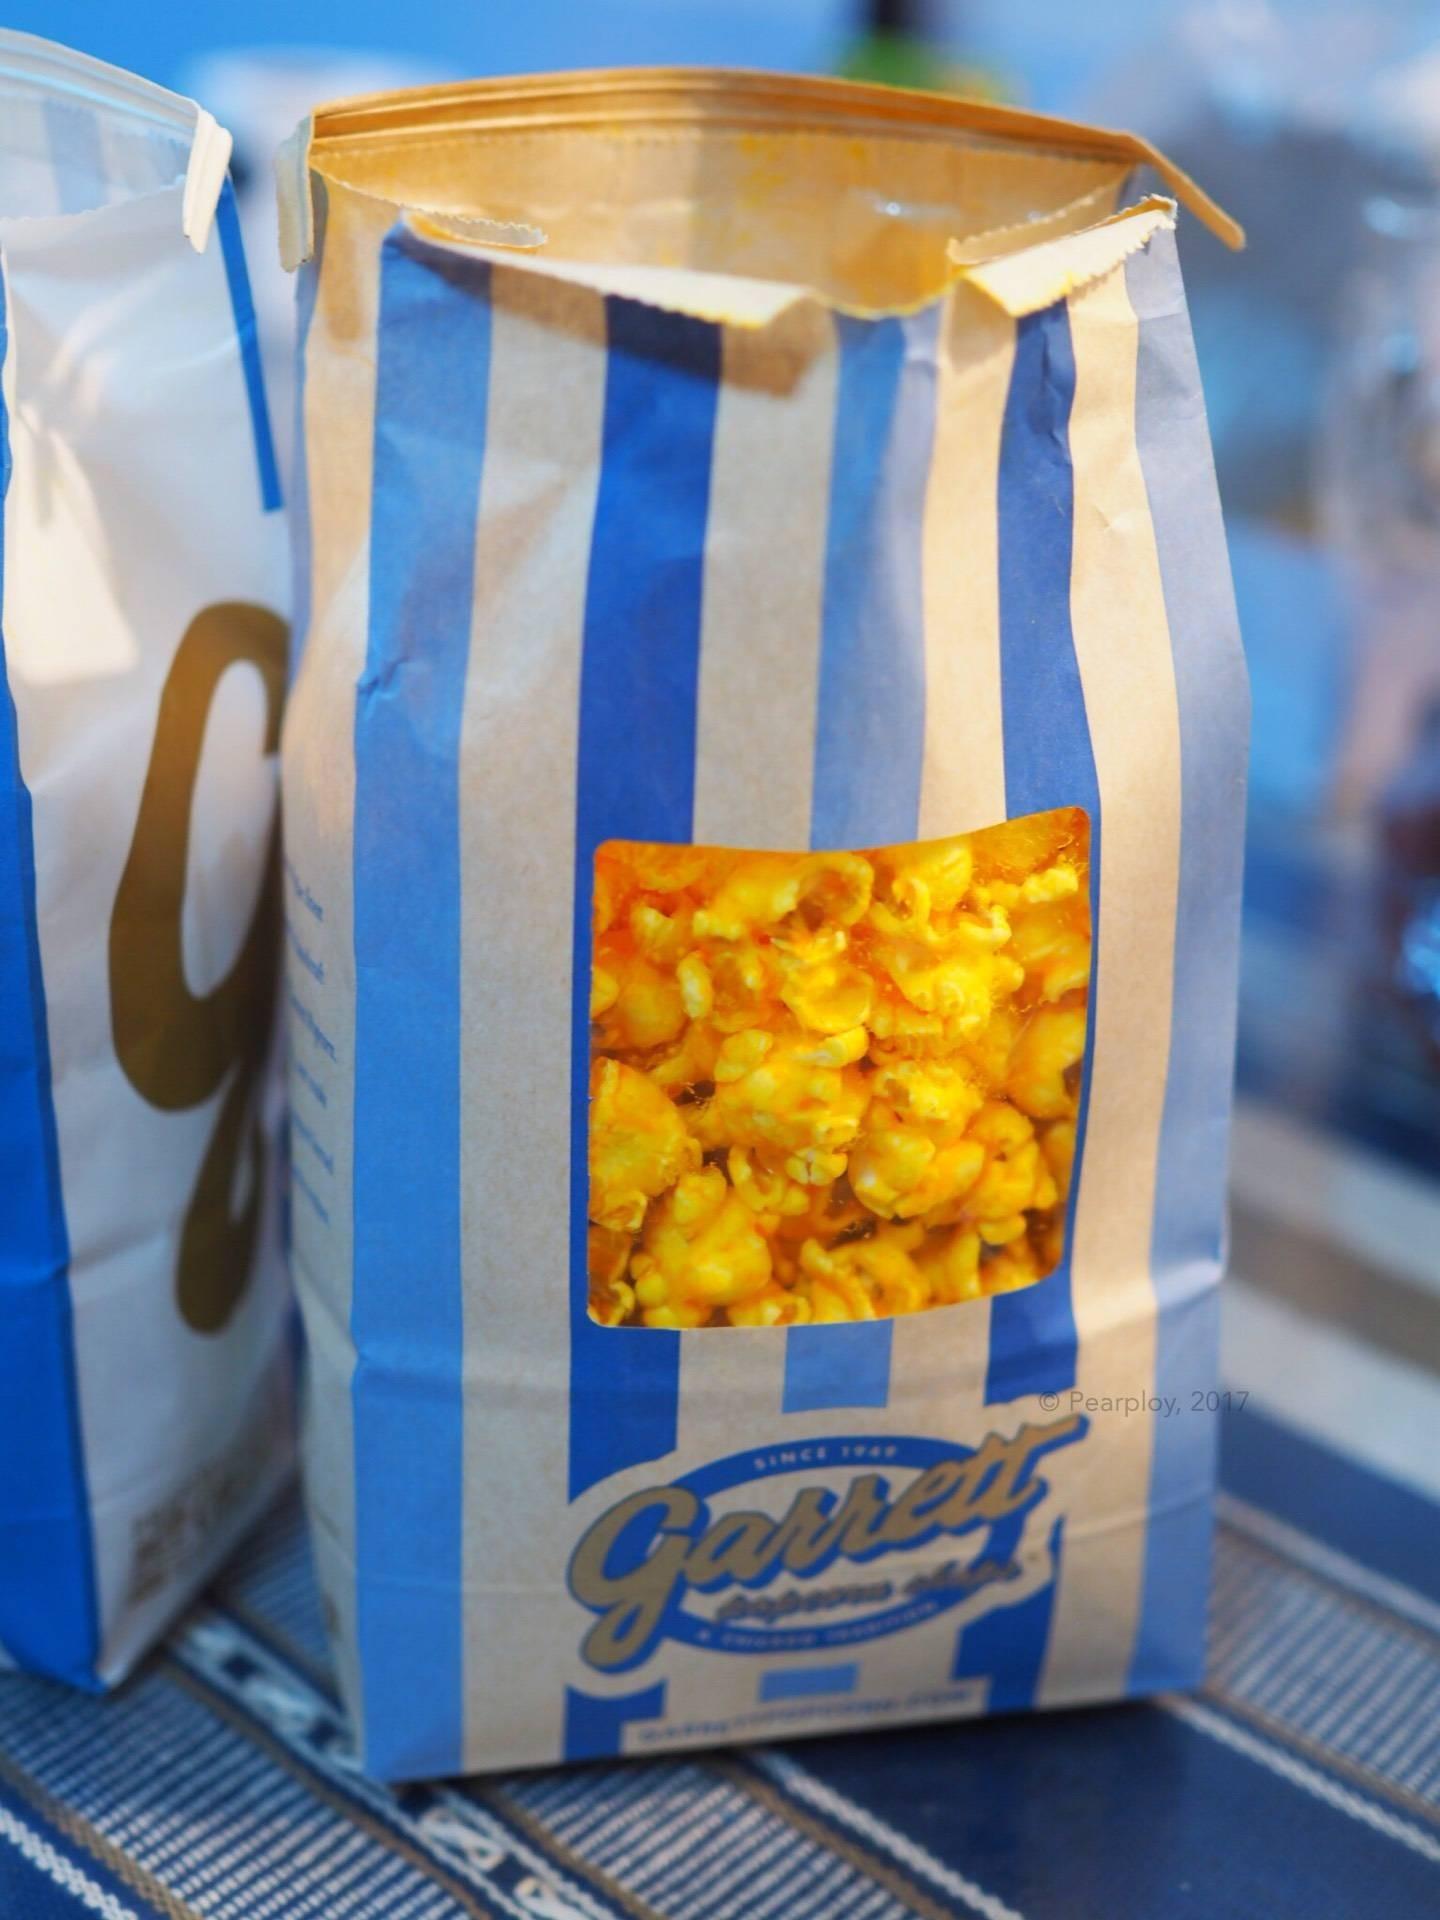 Garrett Popcorn สยามพารากอน